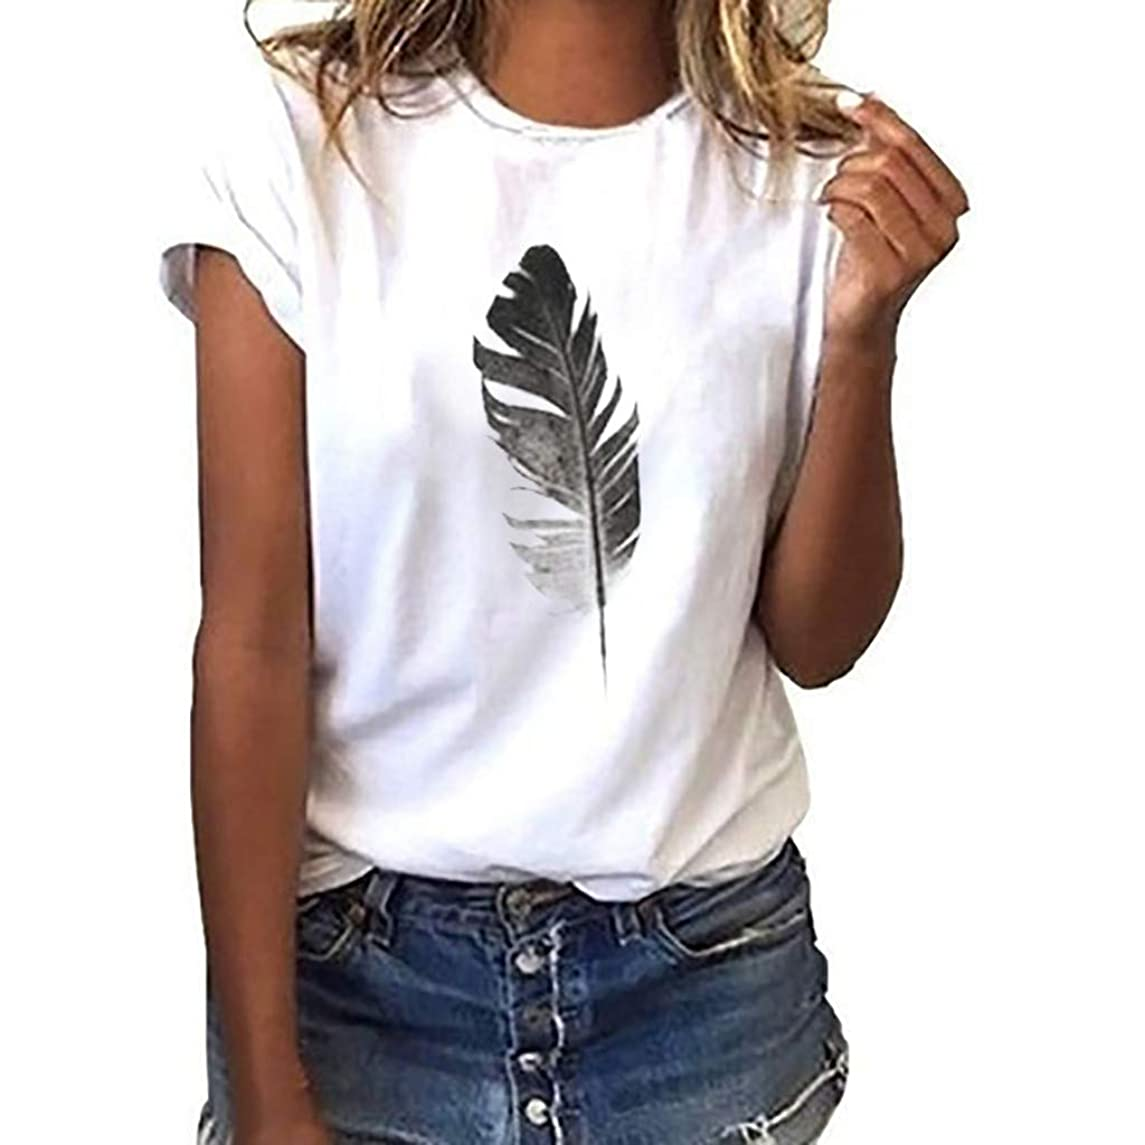 Gergeos Casual Tee Fashion Women's Leaf Print O-Neck Loose Short Sleeve T-Shirt Top